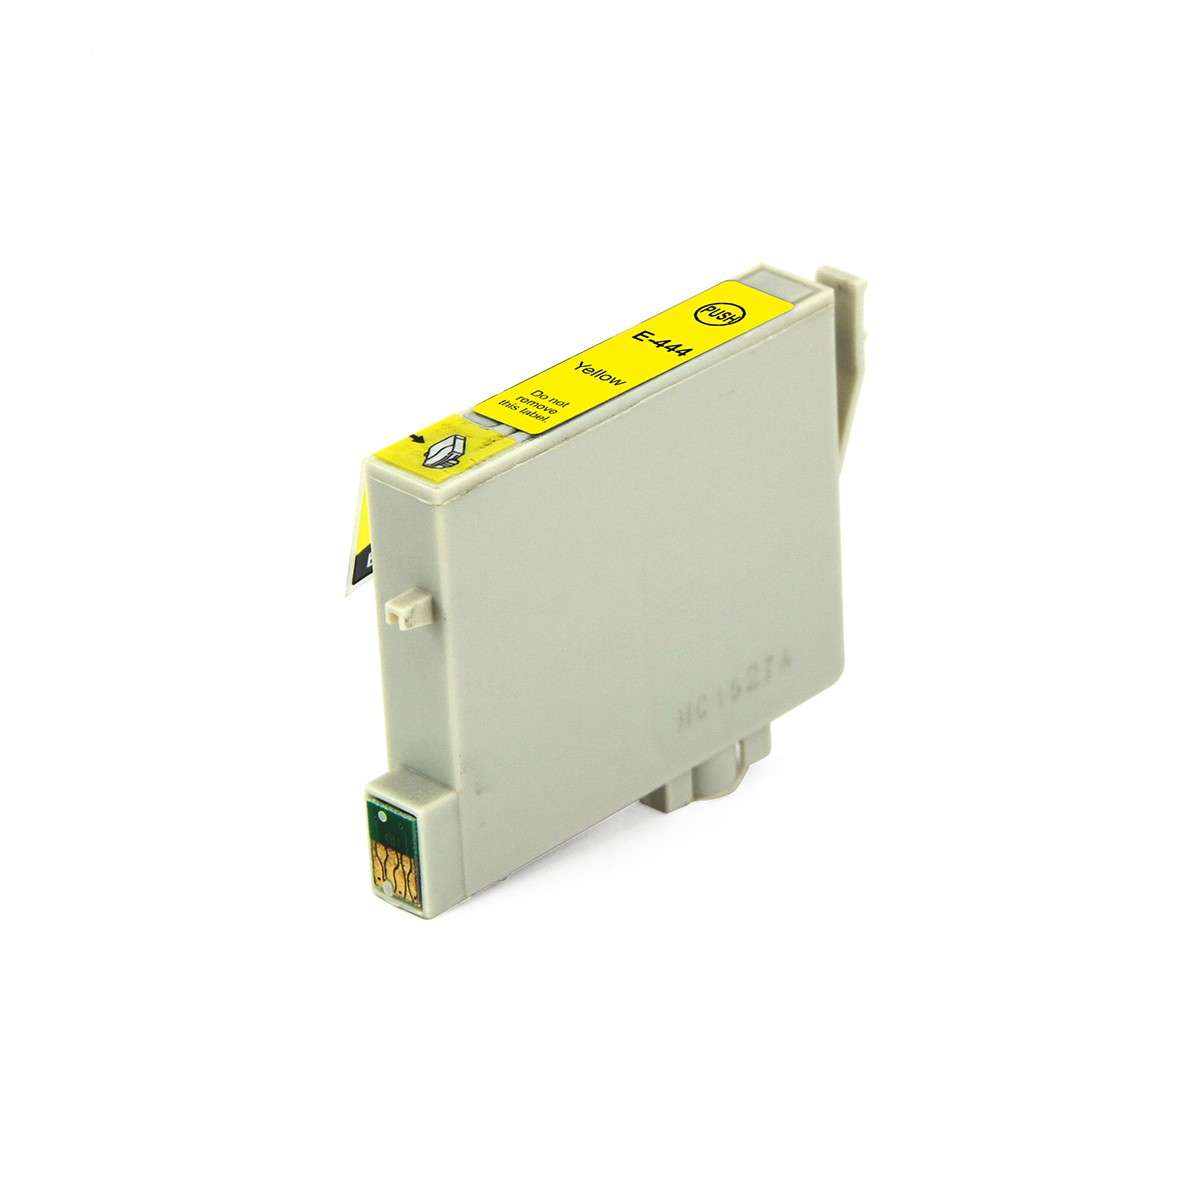 Epson T0444 Yellow Ink Cartridge